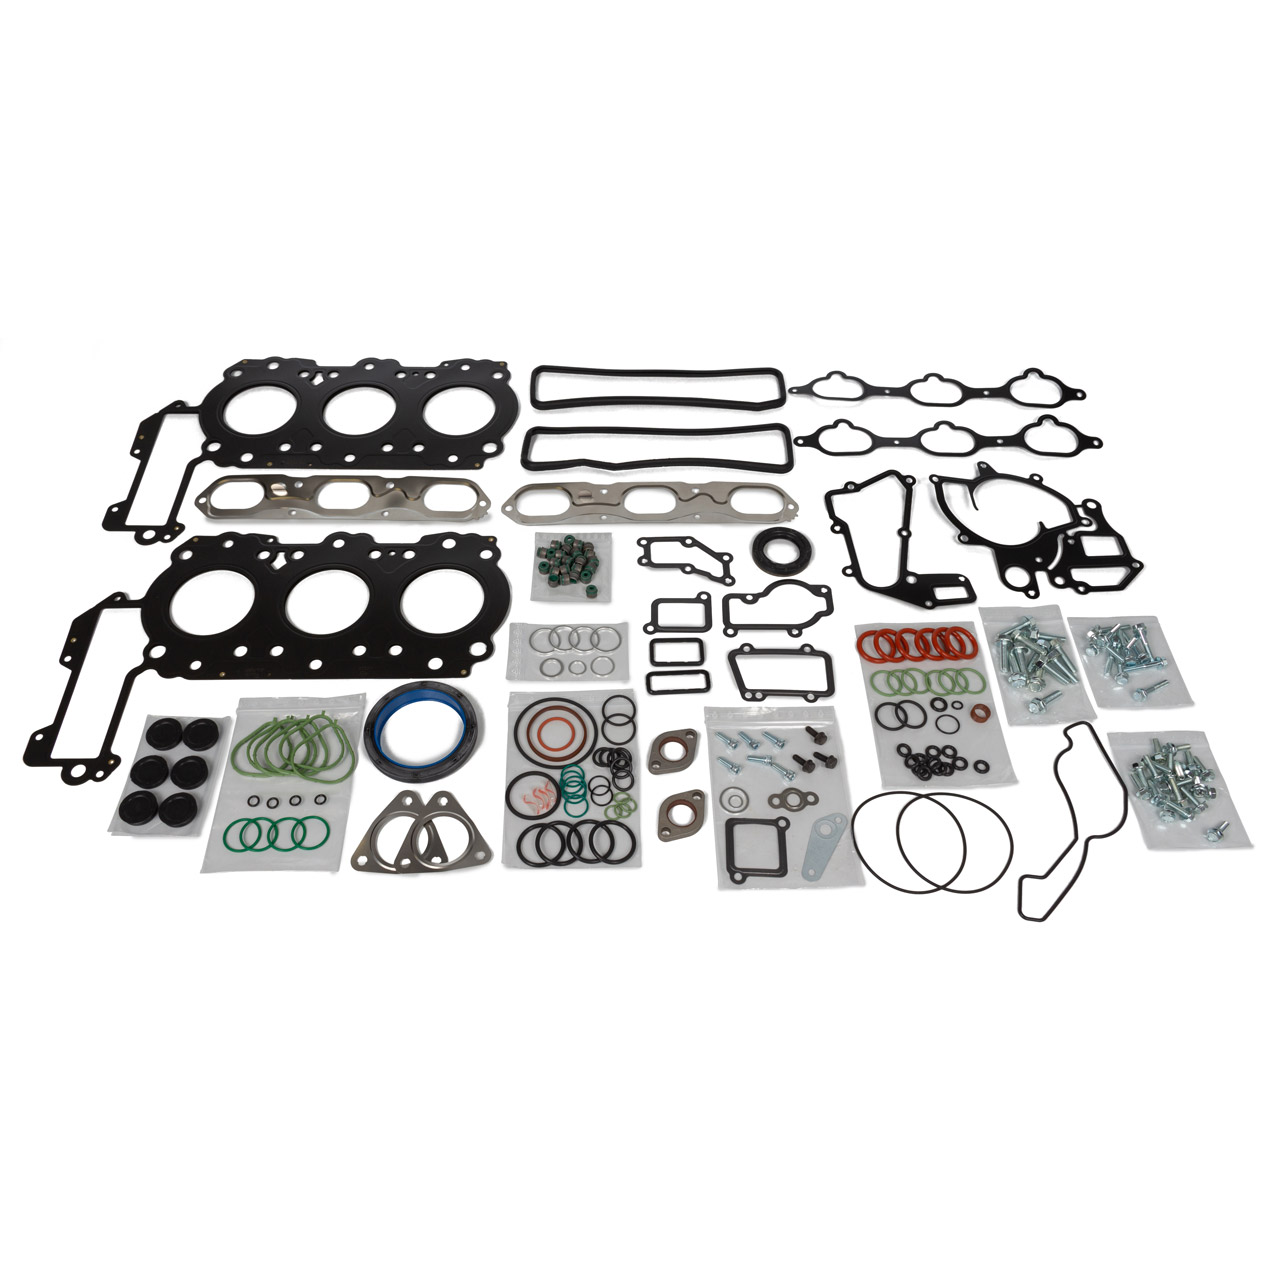 Motordichtungssatz PORSCHE Boxster 986 2.5 204 PS M96.20 1996-1999